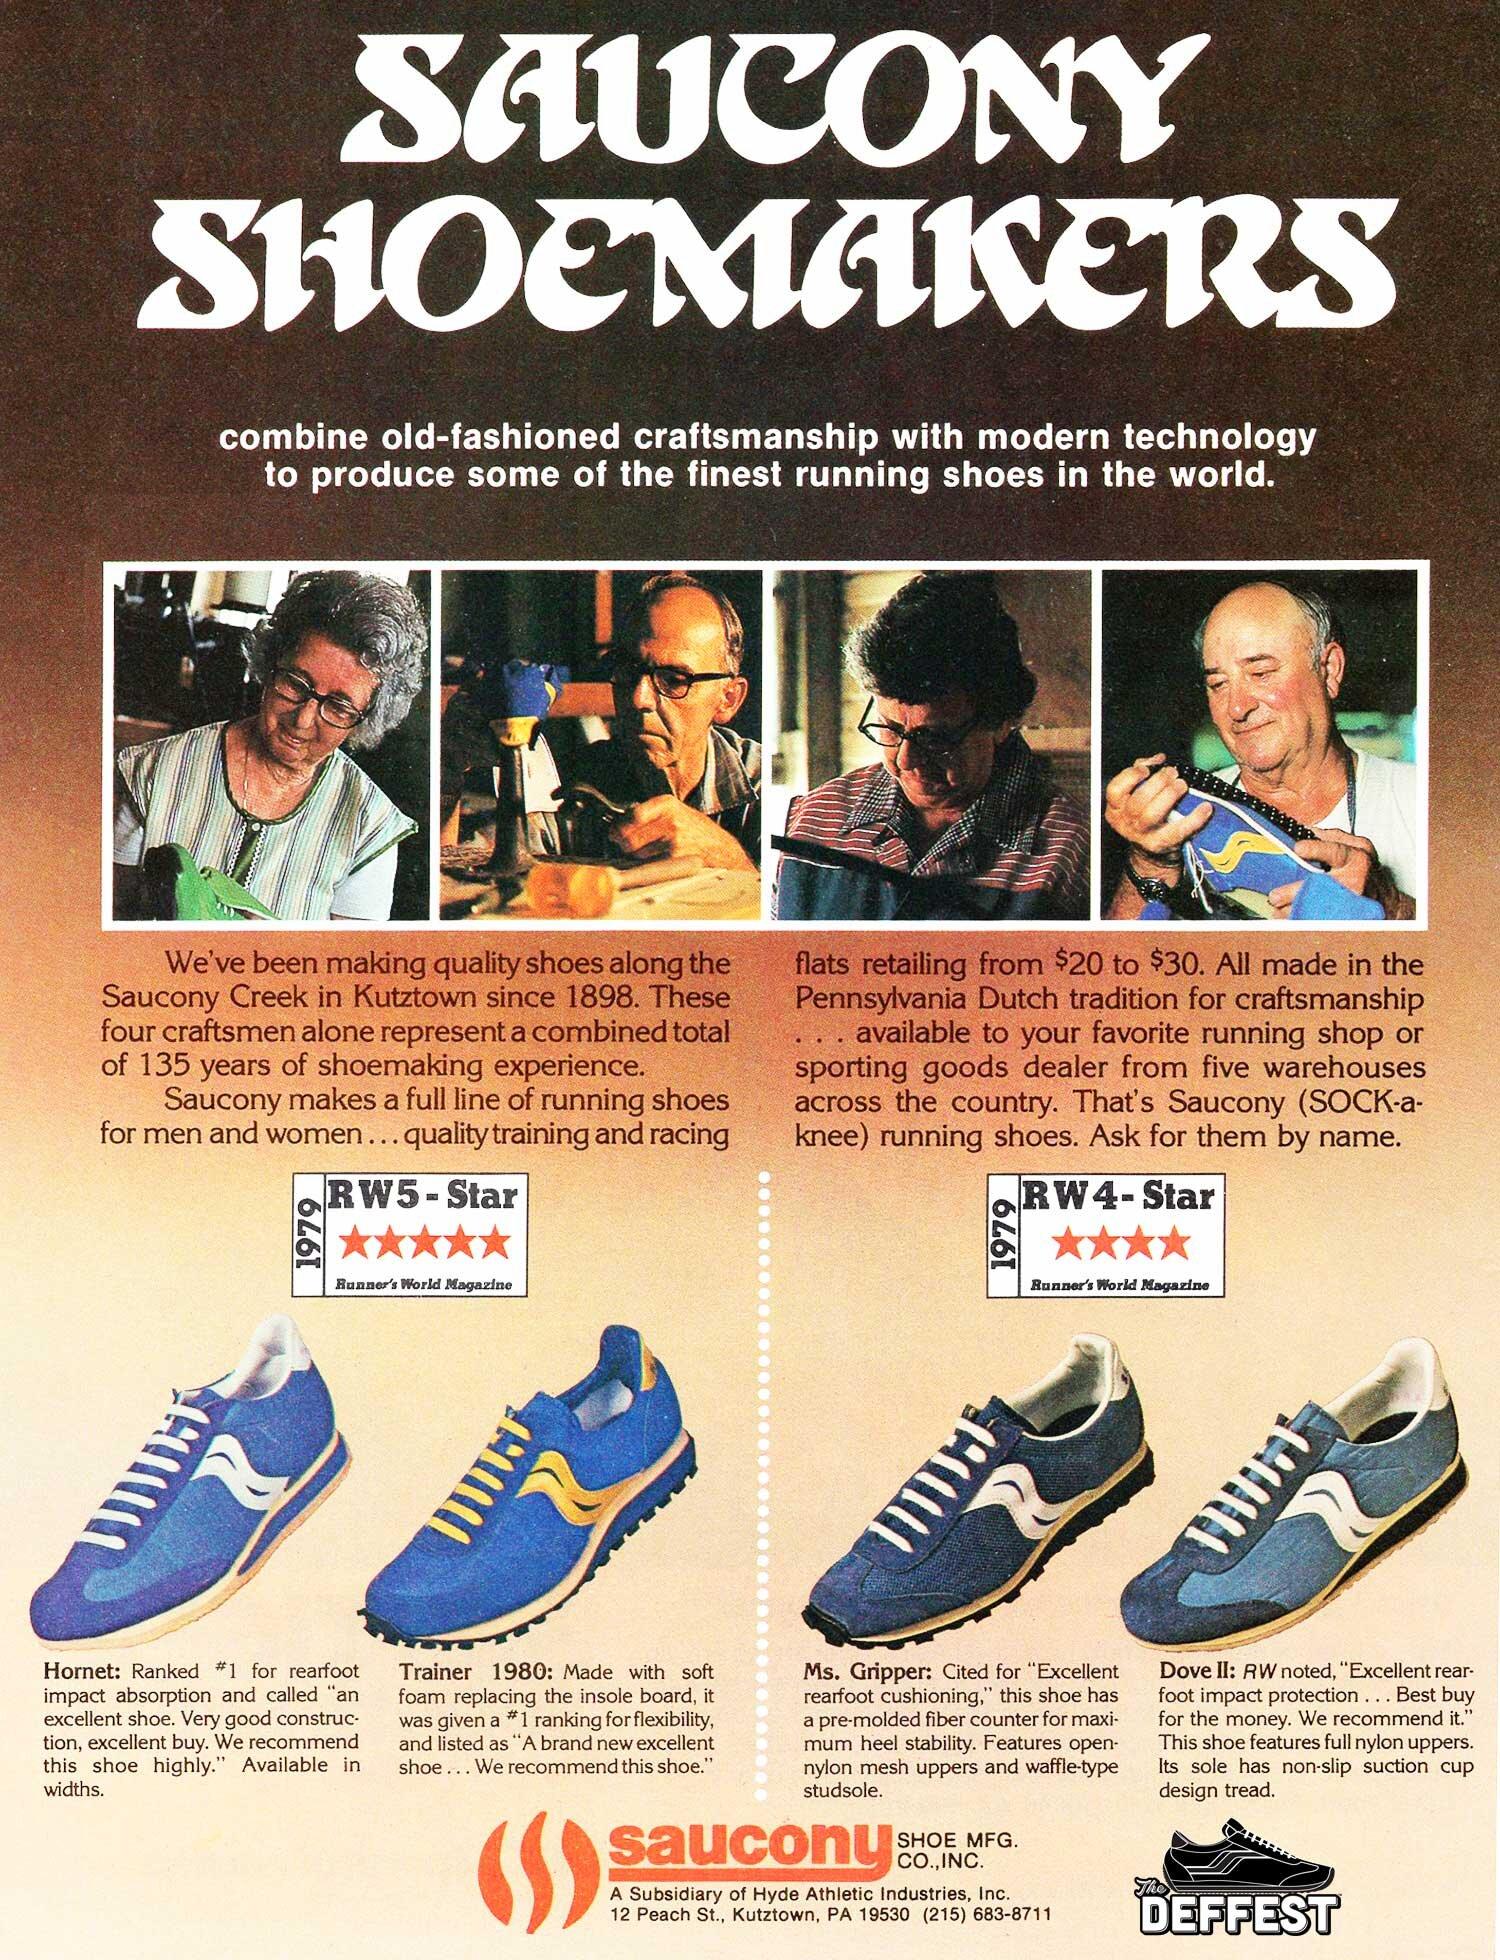 The Deffest A Vintage And Retro Sneaker Blog Saucony 80s Vintage Sneaker Advertisement